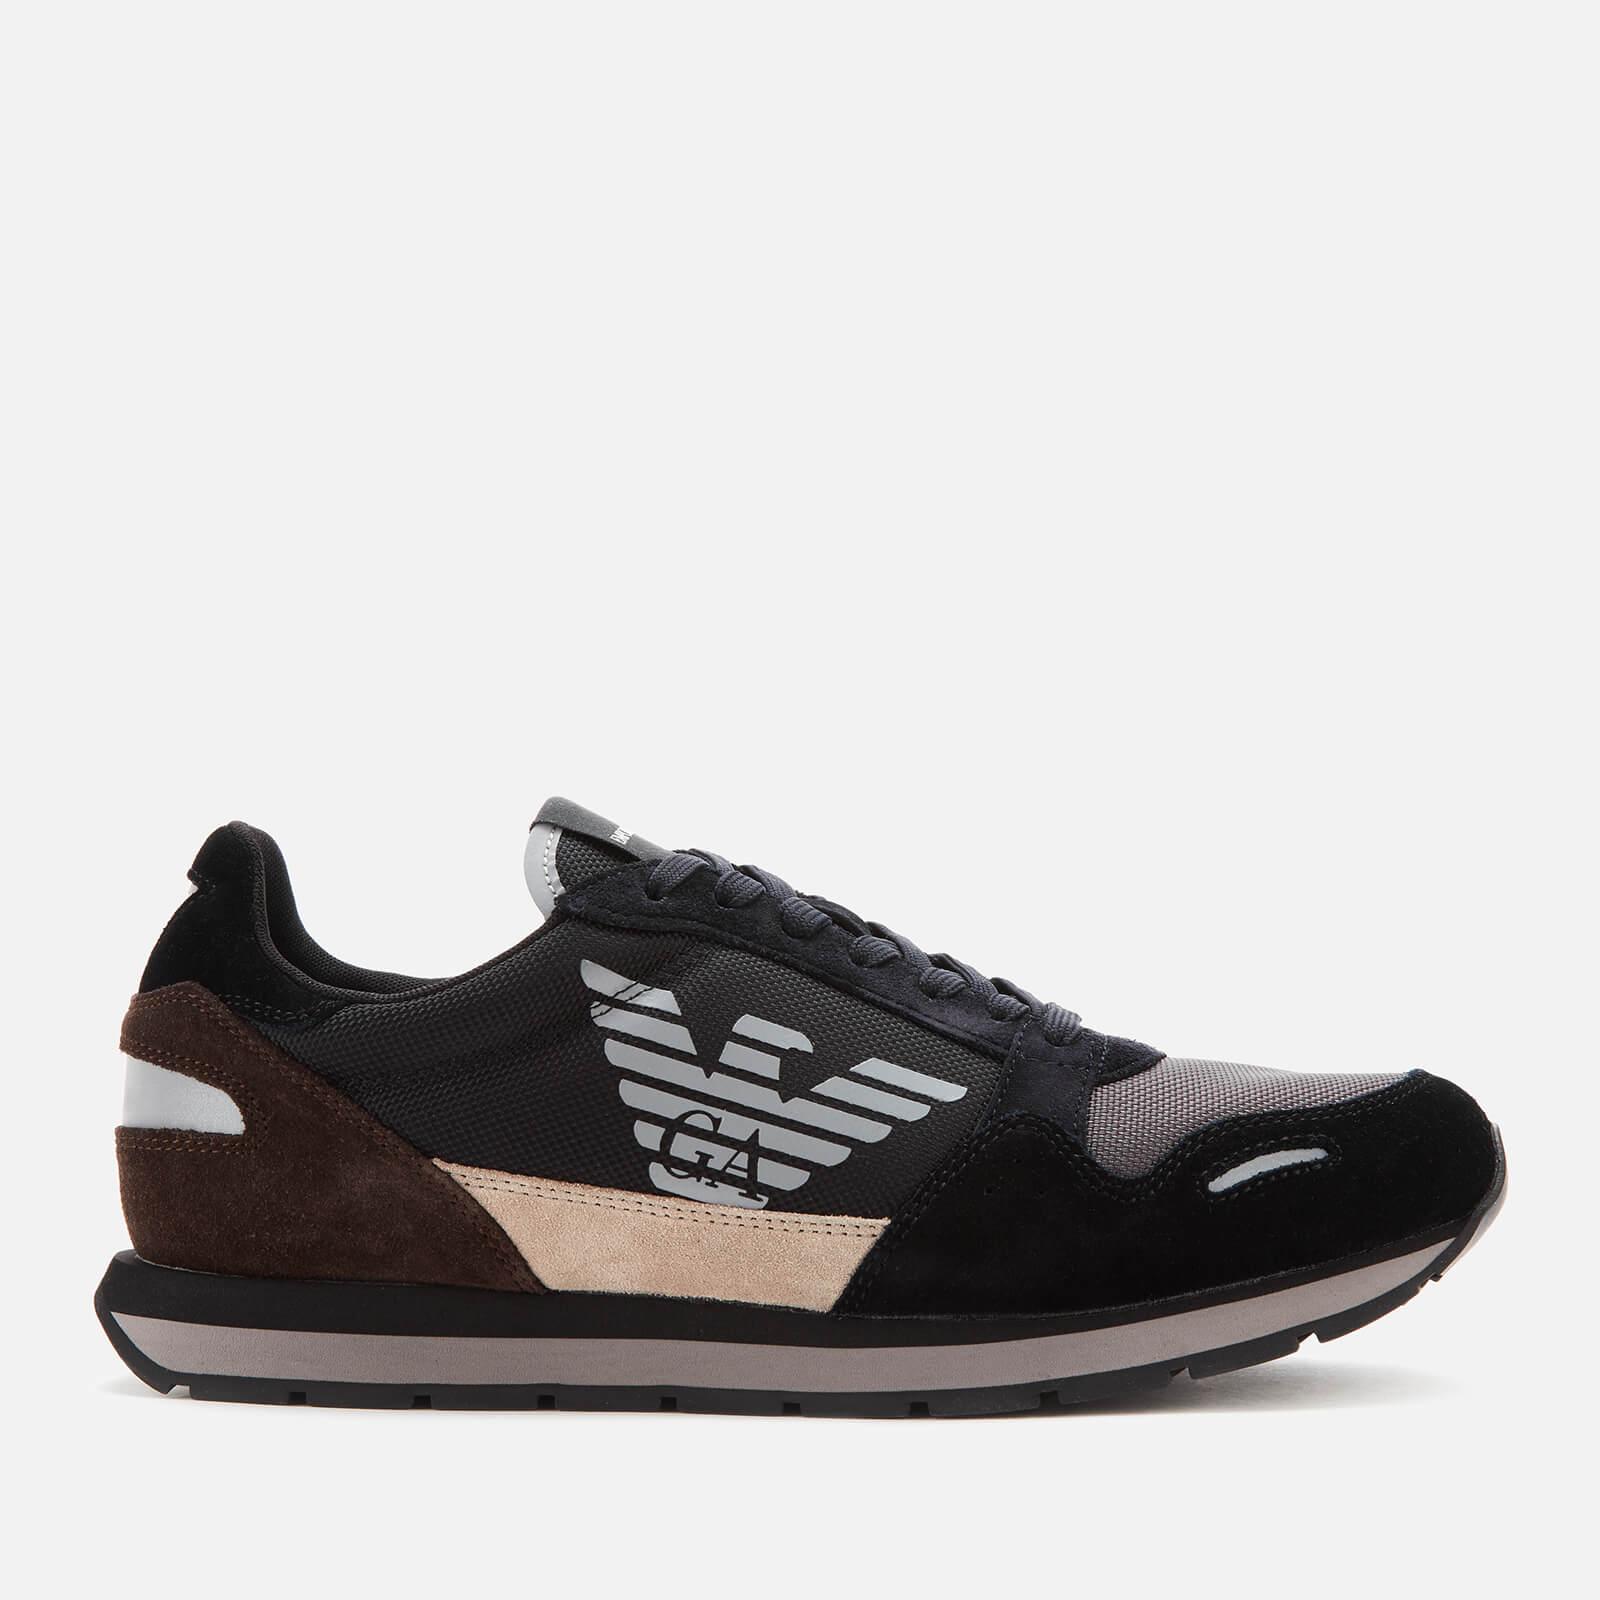 Emporio Armani s Zone Running Style Trainers - Black/Earth/Dark Brown - EU 41/UK 7 - Black